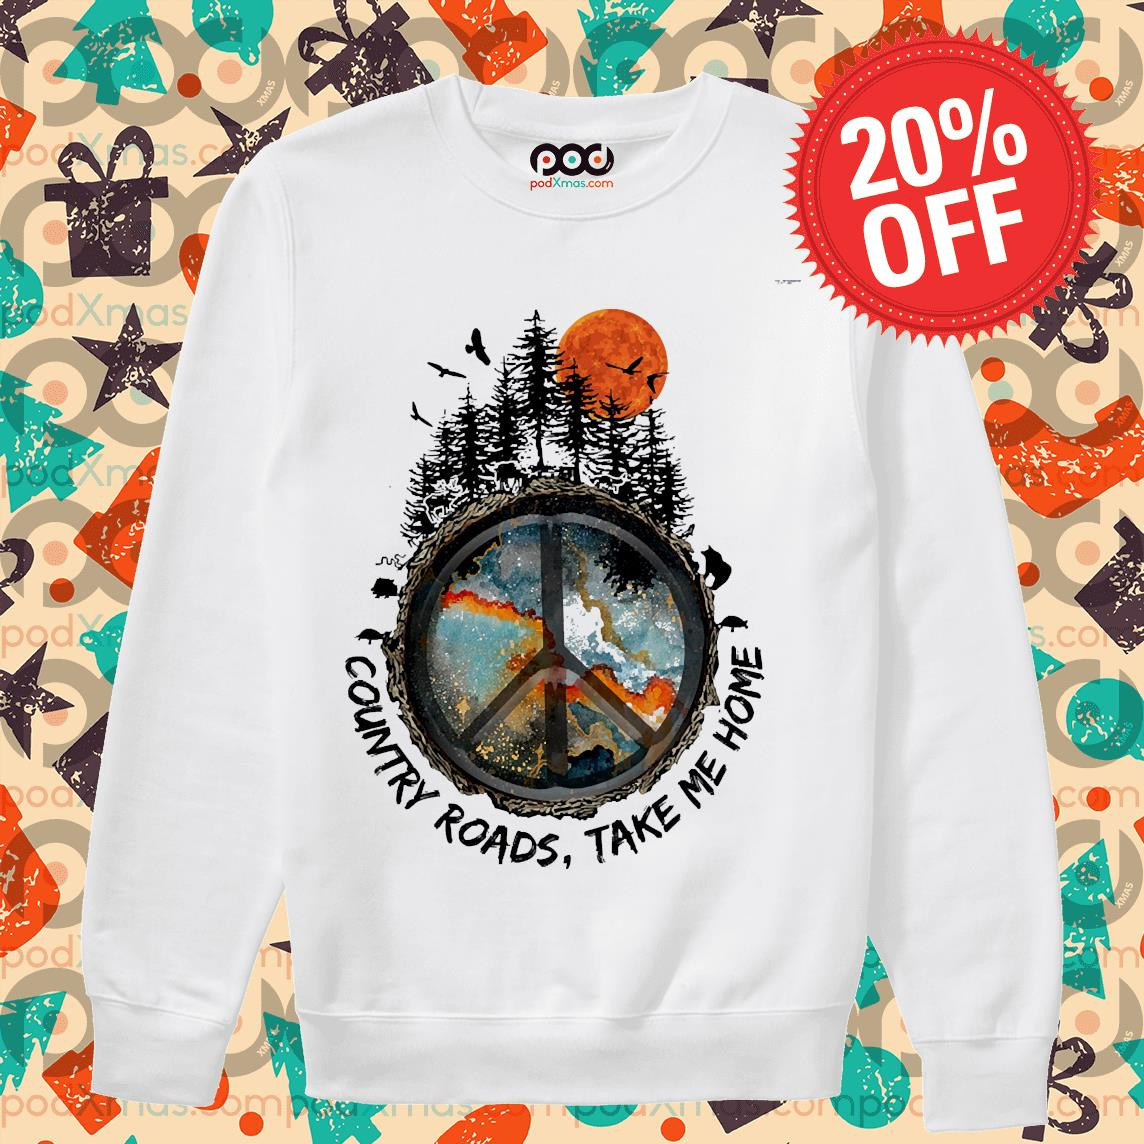 Country Roads Take Me Home Shirt Sweater PODxmas trang